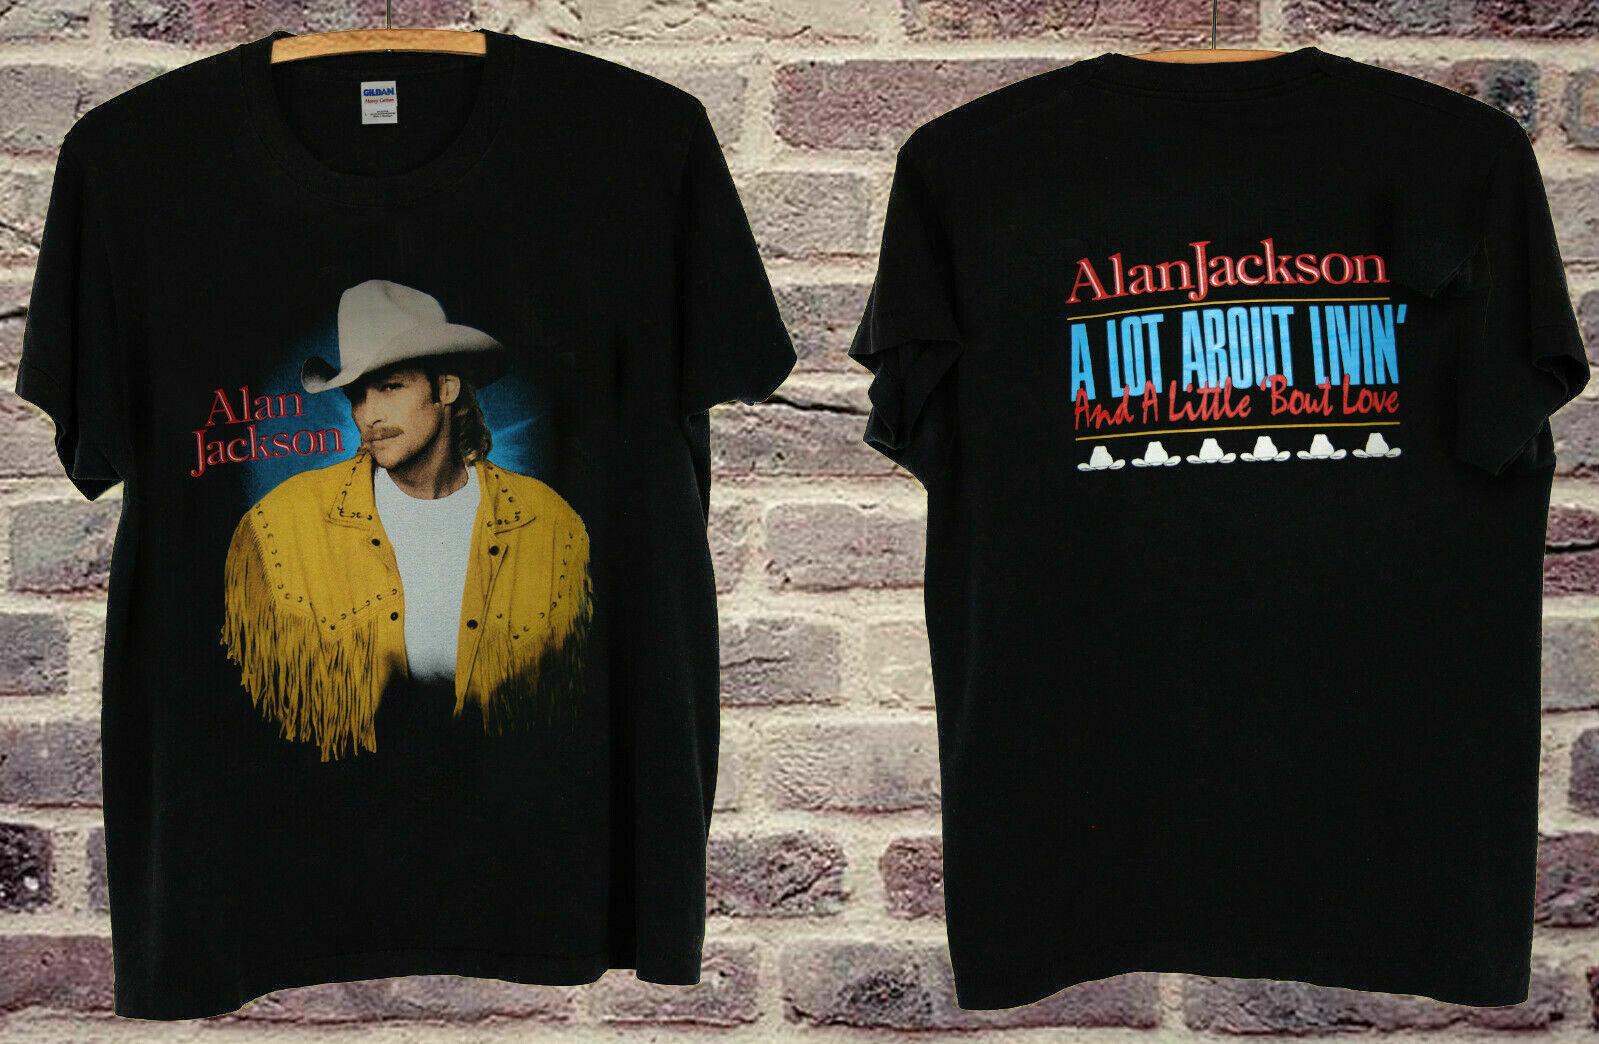 Raro reestampado Vintage concierto ALAN JACKSON 93 Camiseta talla de EE. UU.